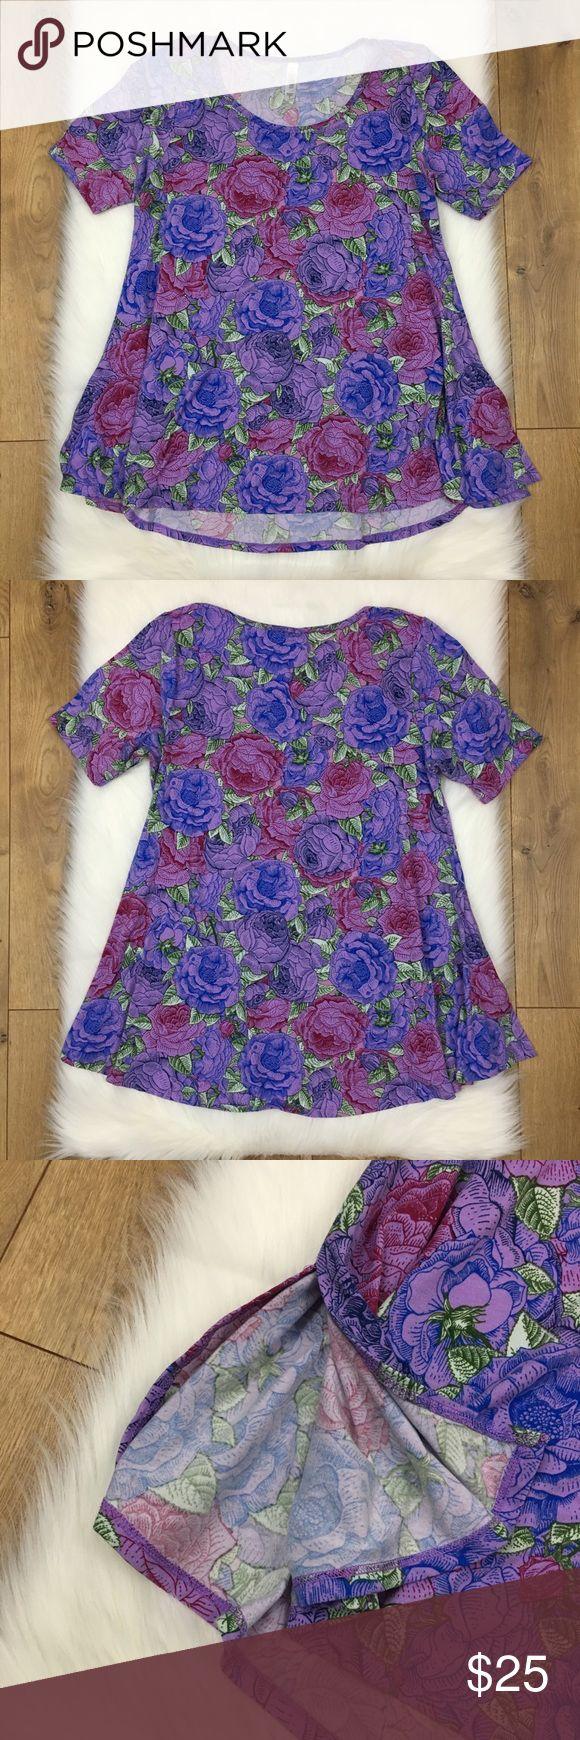 Lularoe Purple Rose Classic T Tunic Shirt Lularoe Purple Rose Classic T Tunic Shirt. In excellent used condition.  Women's Size Medium. LuLaRoe Tops Tees - Short Sleeve